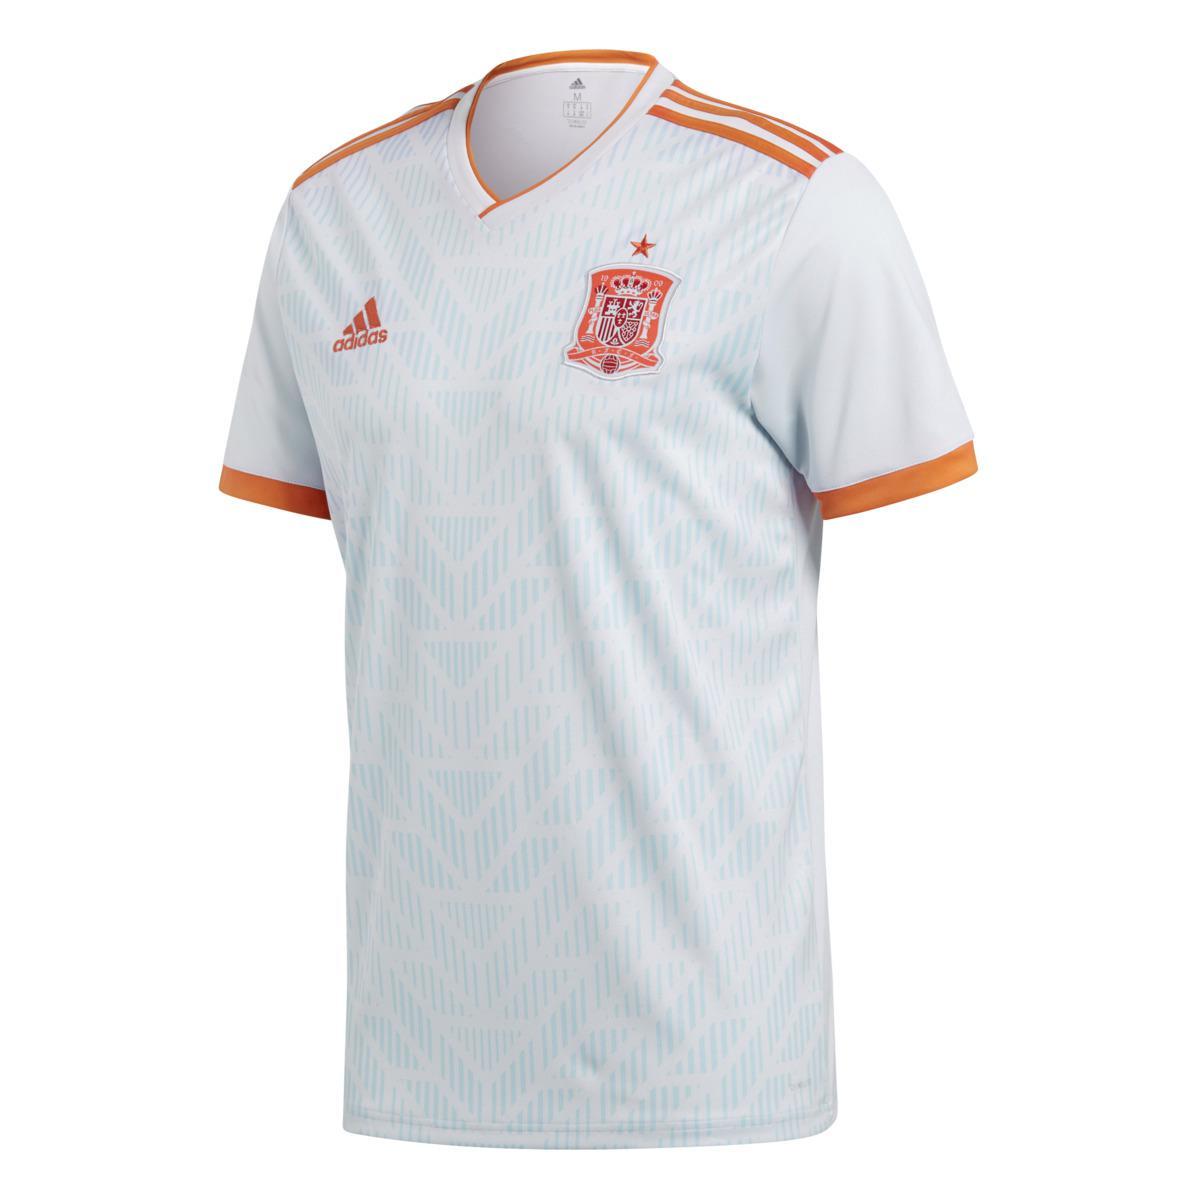 7ebb3d34f35 adidas. Men s White Spanish National Football Team 2018 Away Strip T-shirt.   85 From El Corte Ingles